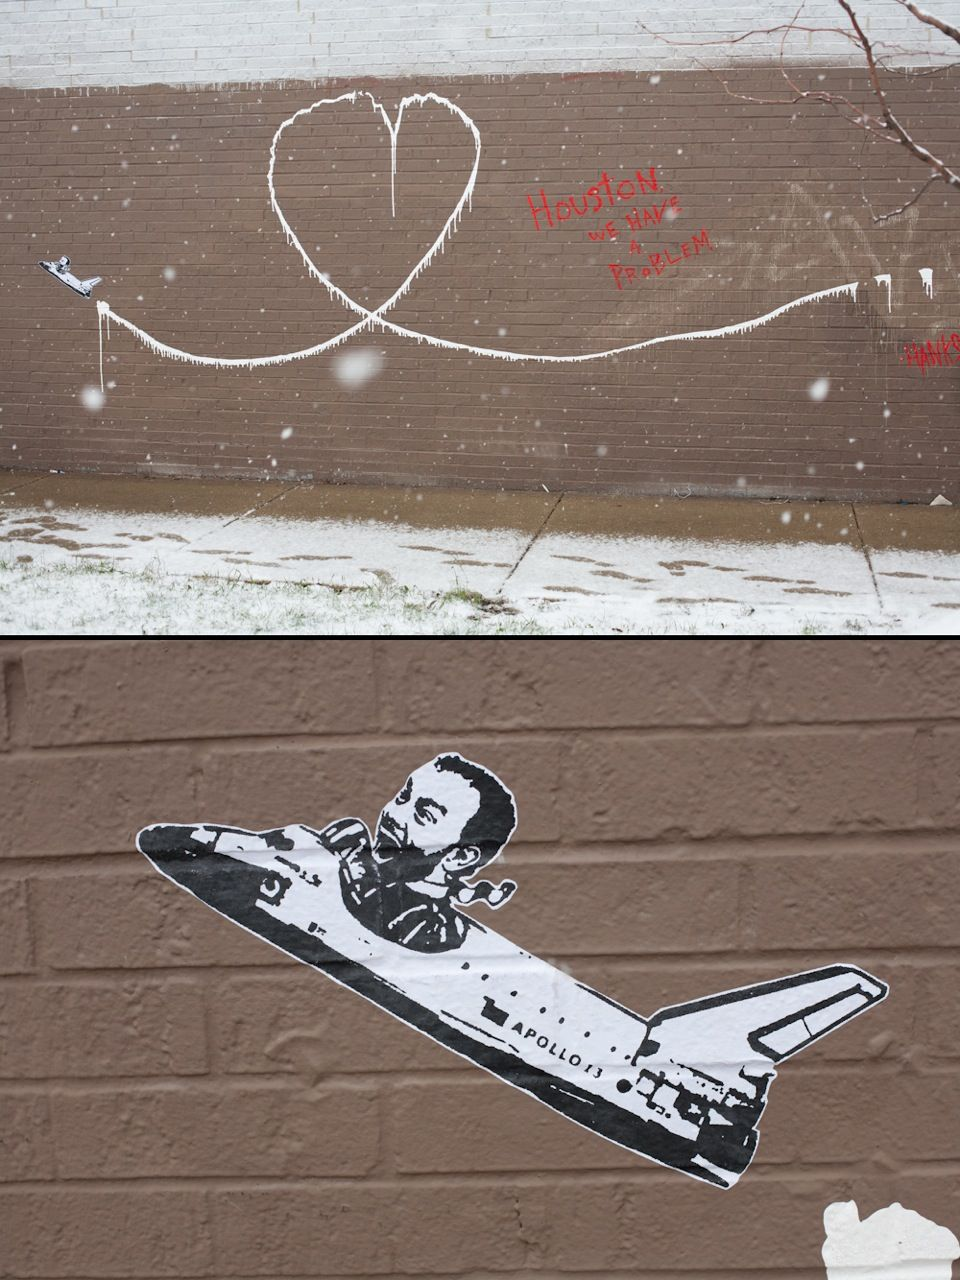 Hanksy In Chicago Street Artist Hanksy Subverts Banksy S High Profile Pieces By Inserting Tom Hanks Into The Scene Funny Art Memes Street Artists Art